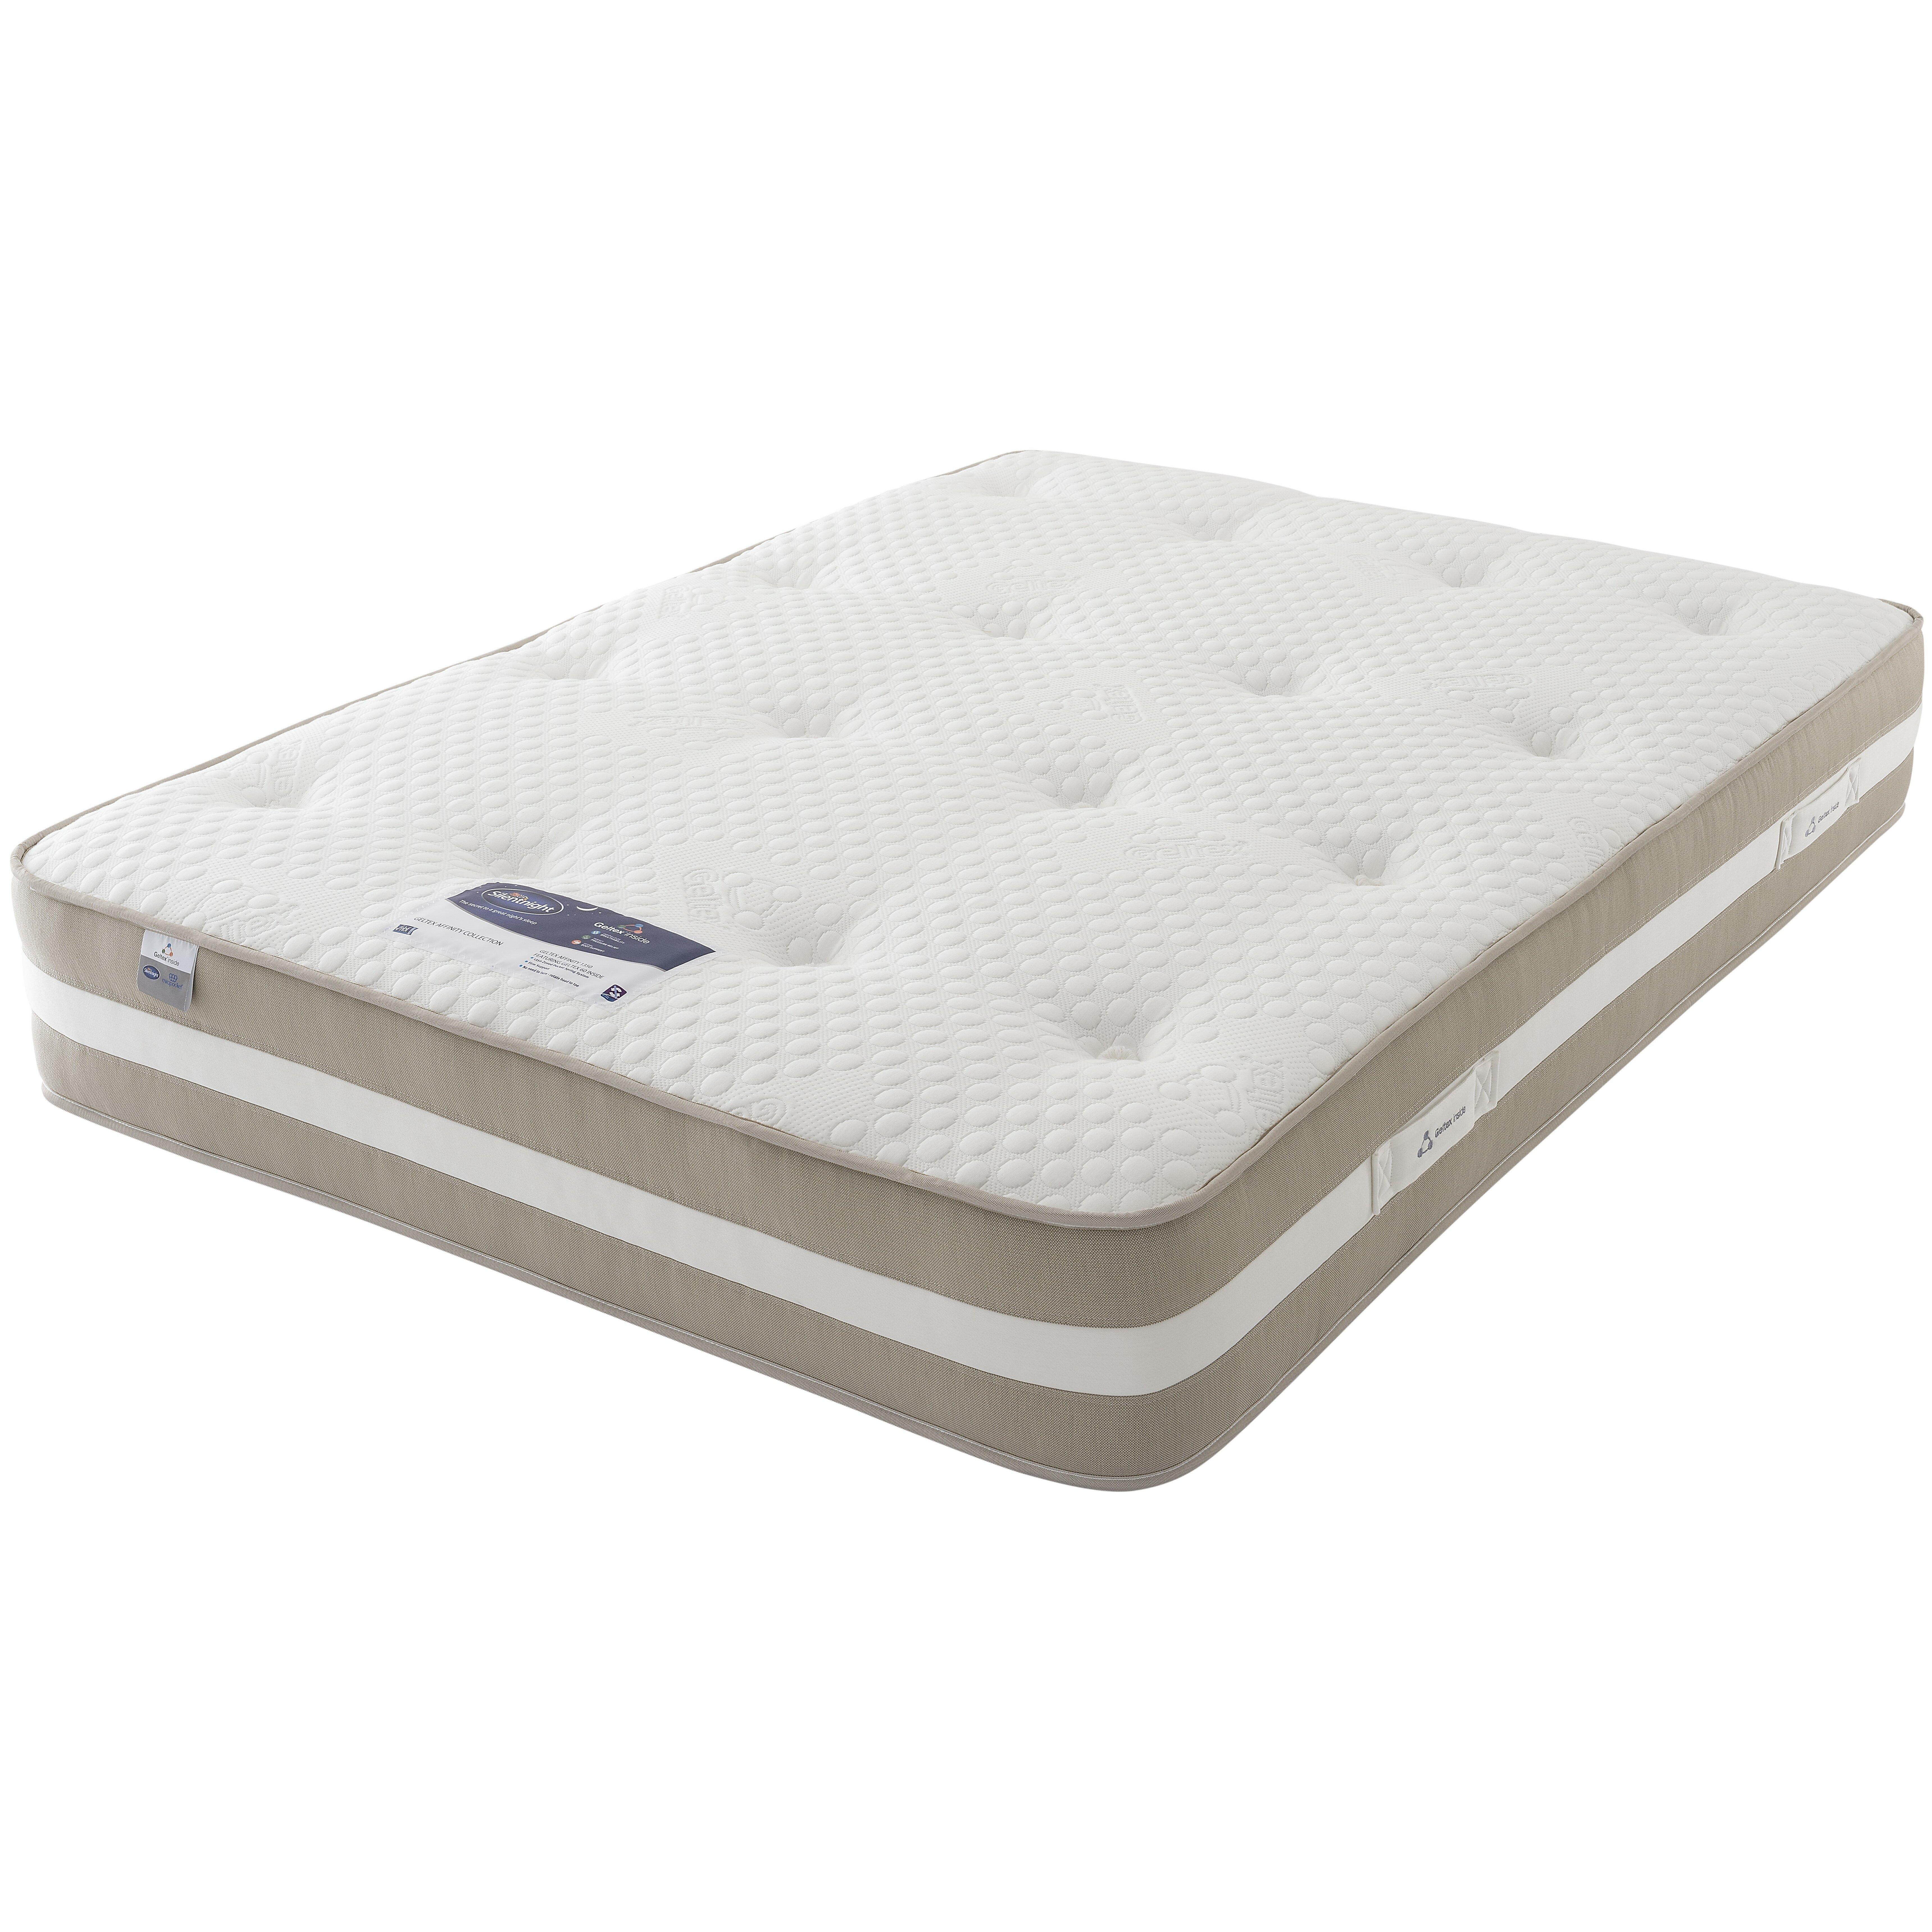 Silentnight melissa pocket sprung 1350 mattress wayfair uk for Pocket sprung